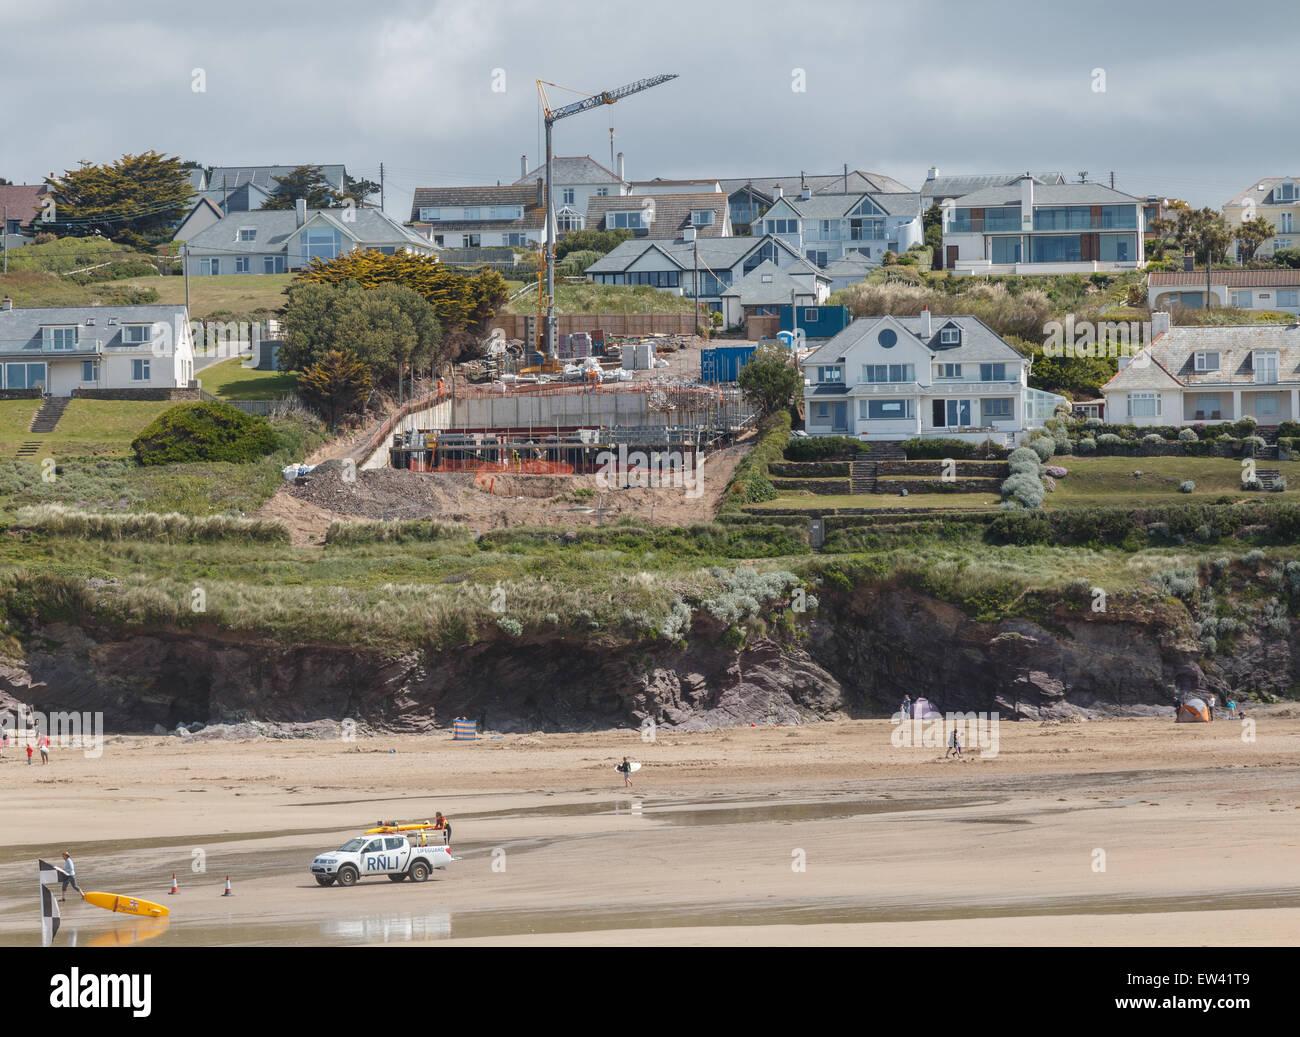 Property development on the coast at Polzeath on the north coast of Cornwall, UK - Stock Image